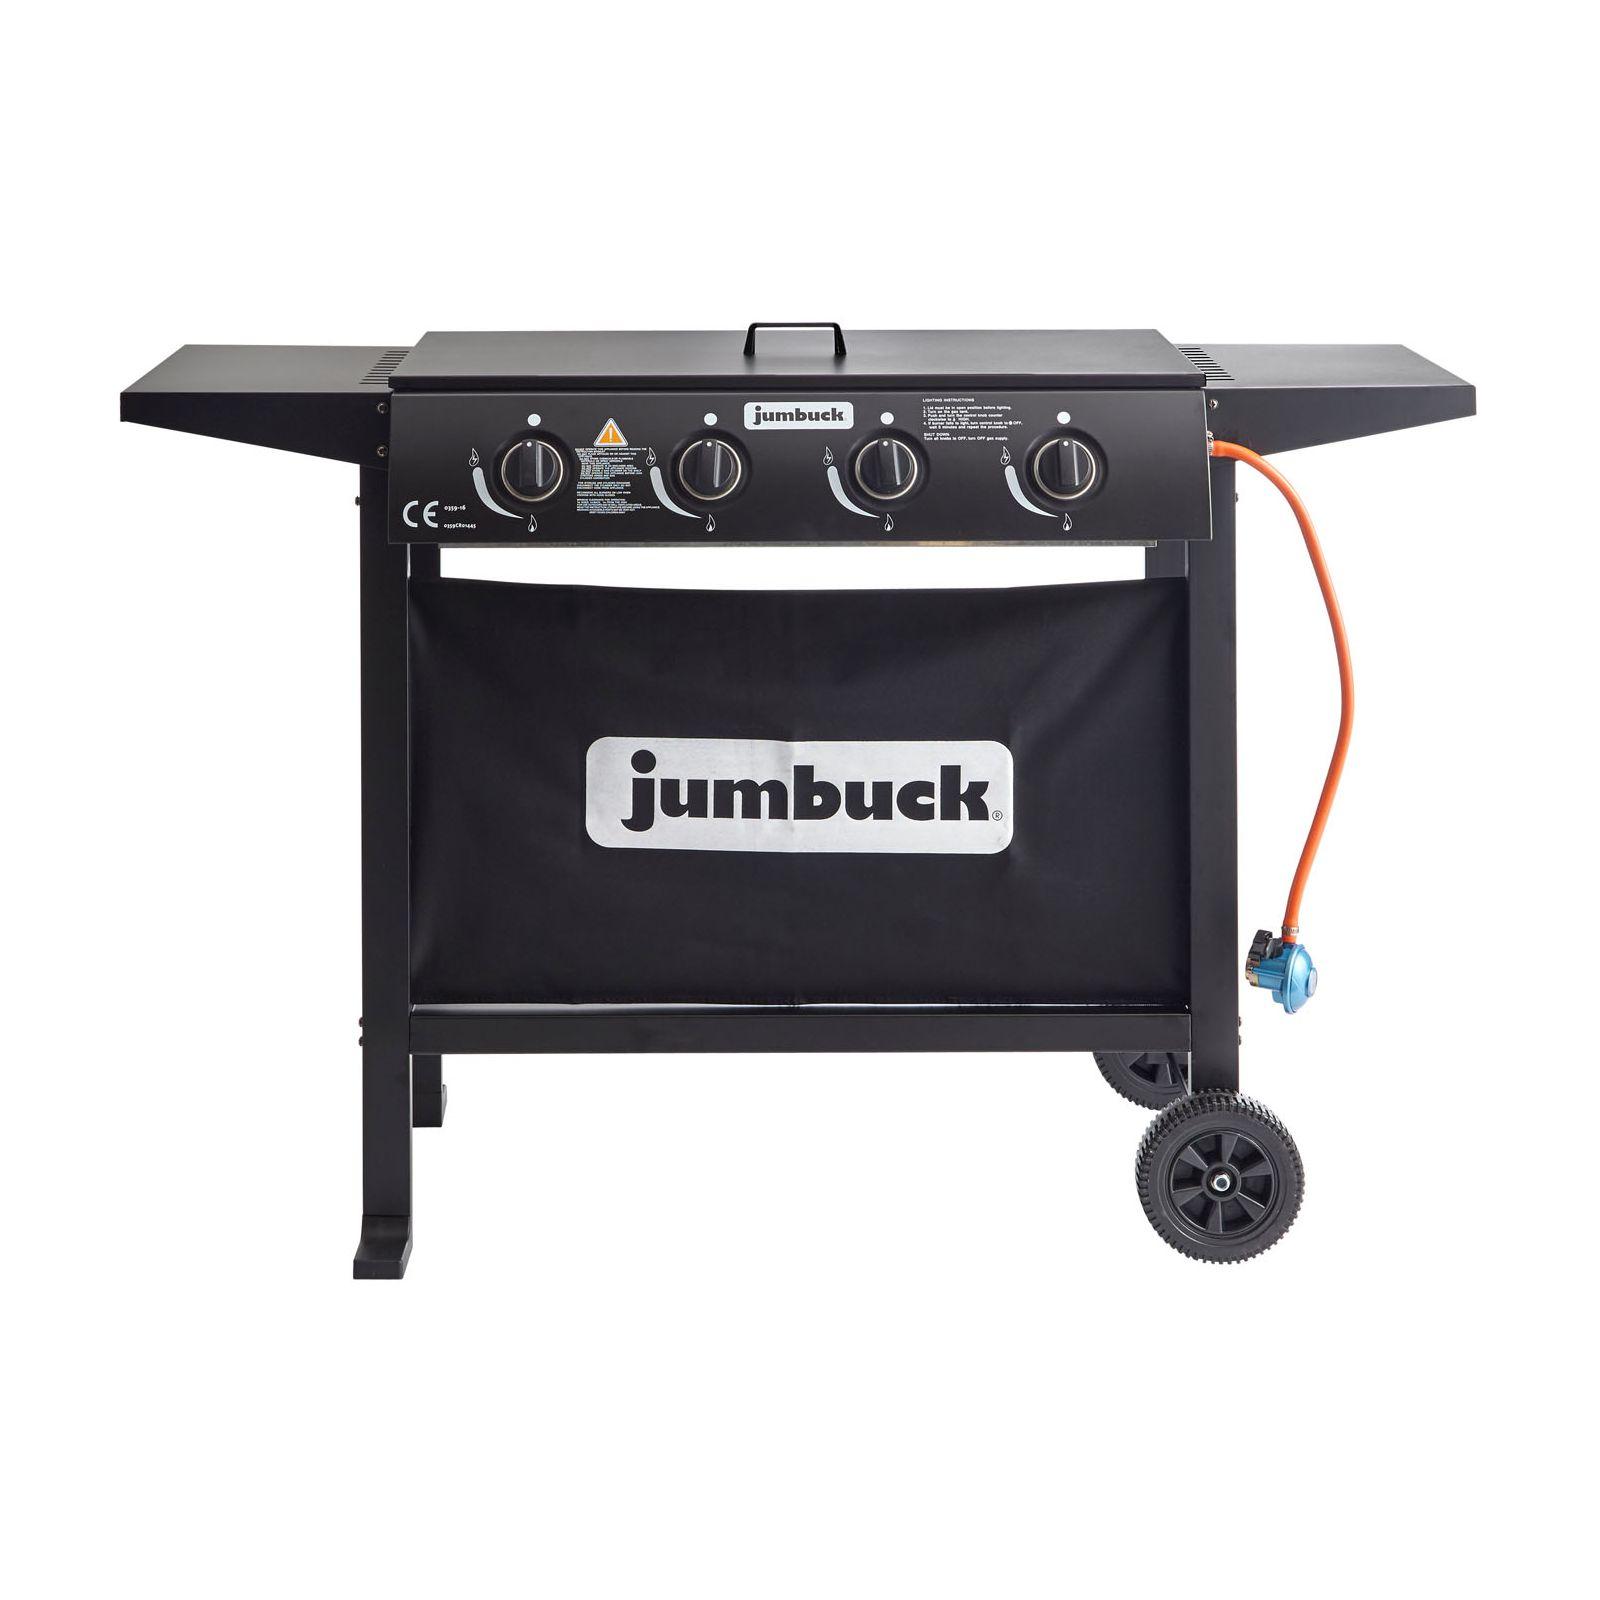 Jumbuck 4 Burner Flat Top Urban BBQ £99 @ Homebase (Instore)